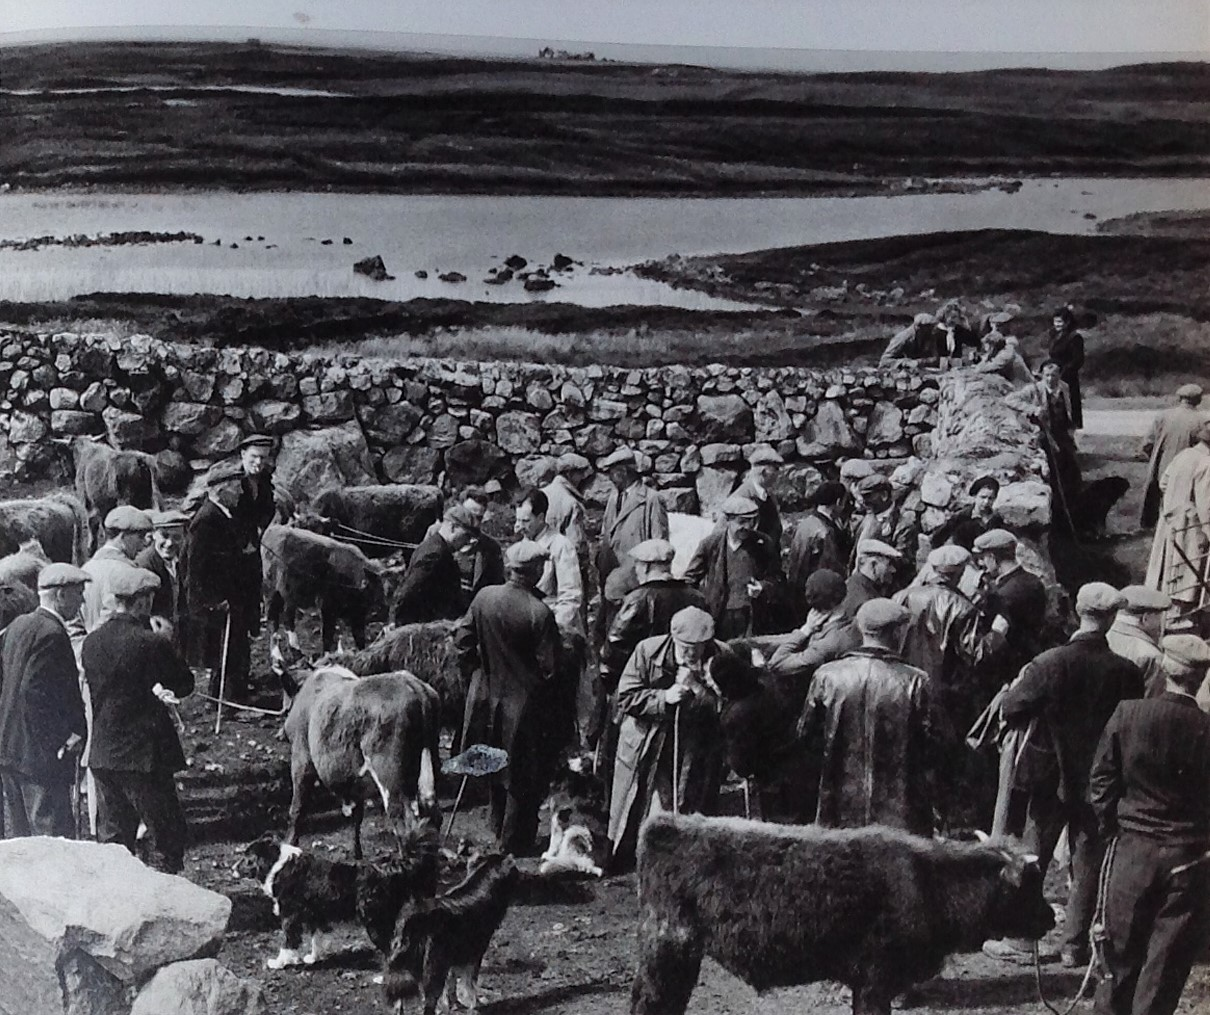 Cattle sale, Loch Ollay. Paul Strand, 1962